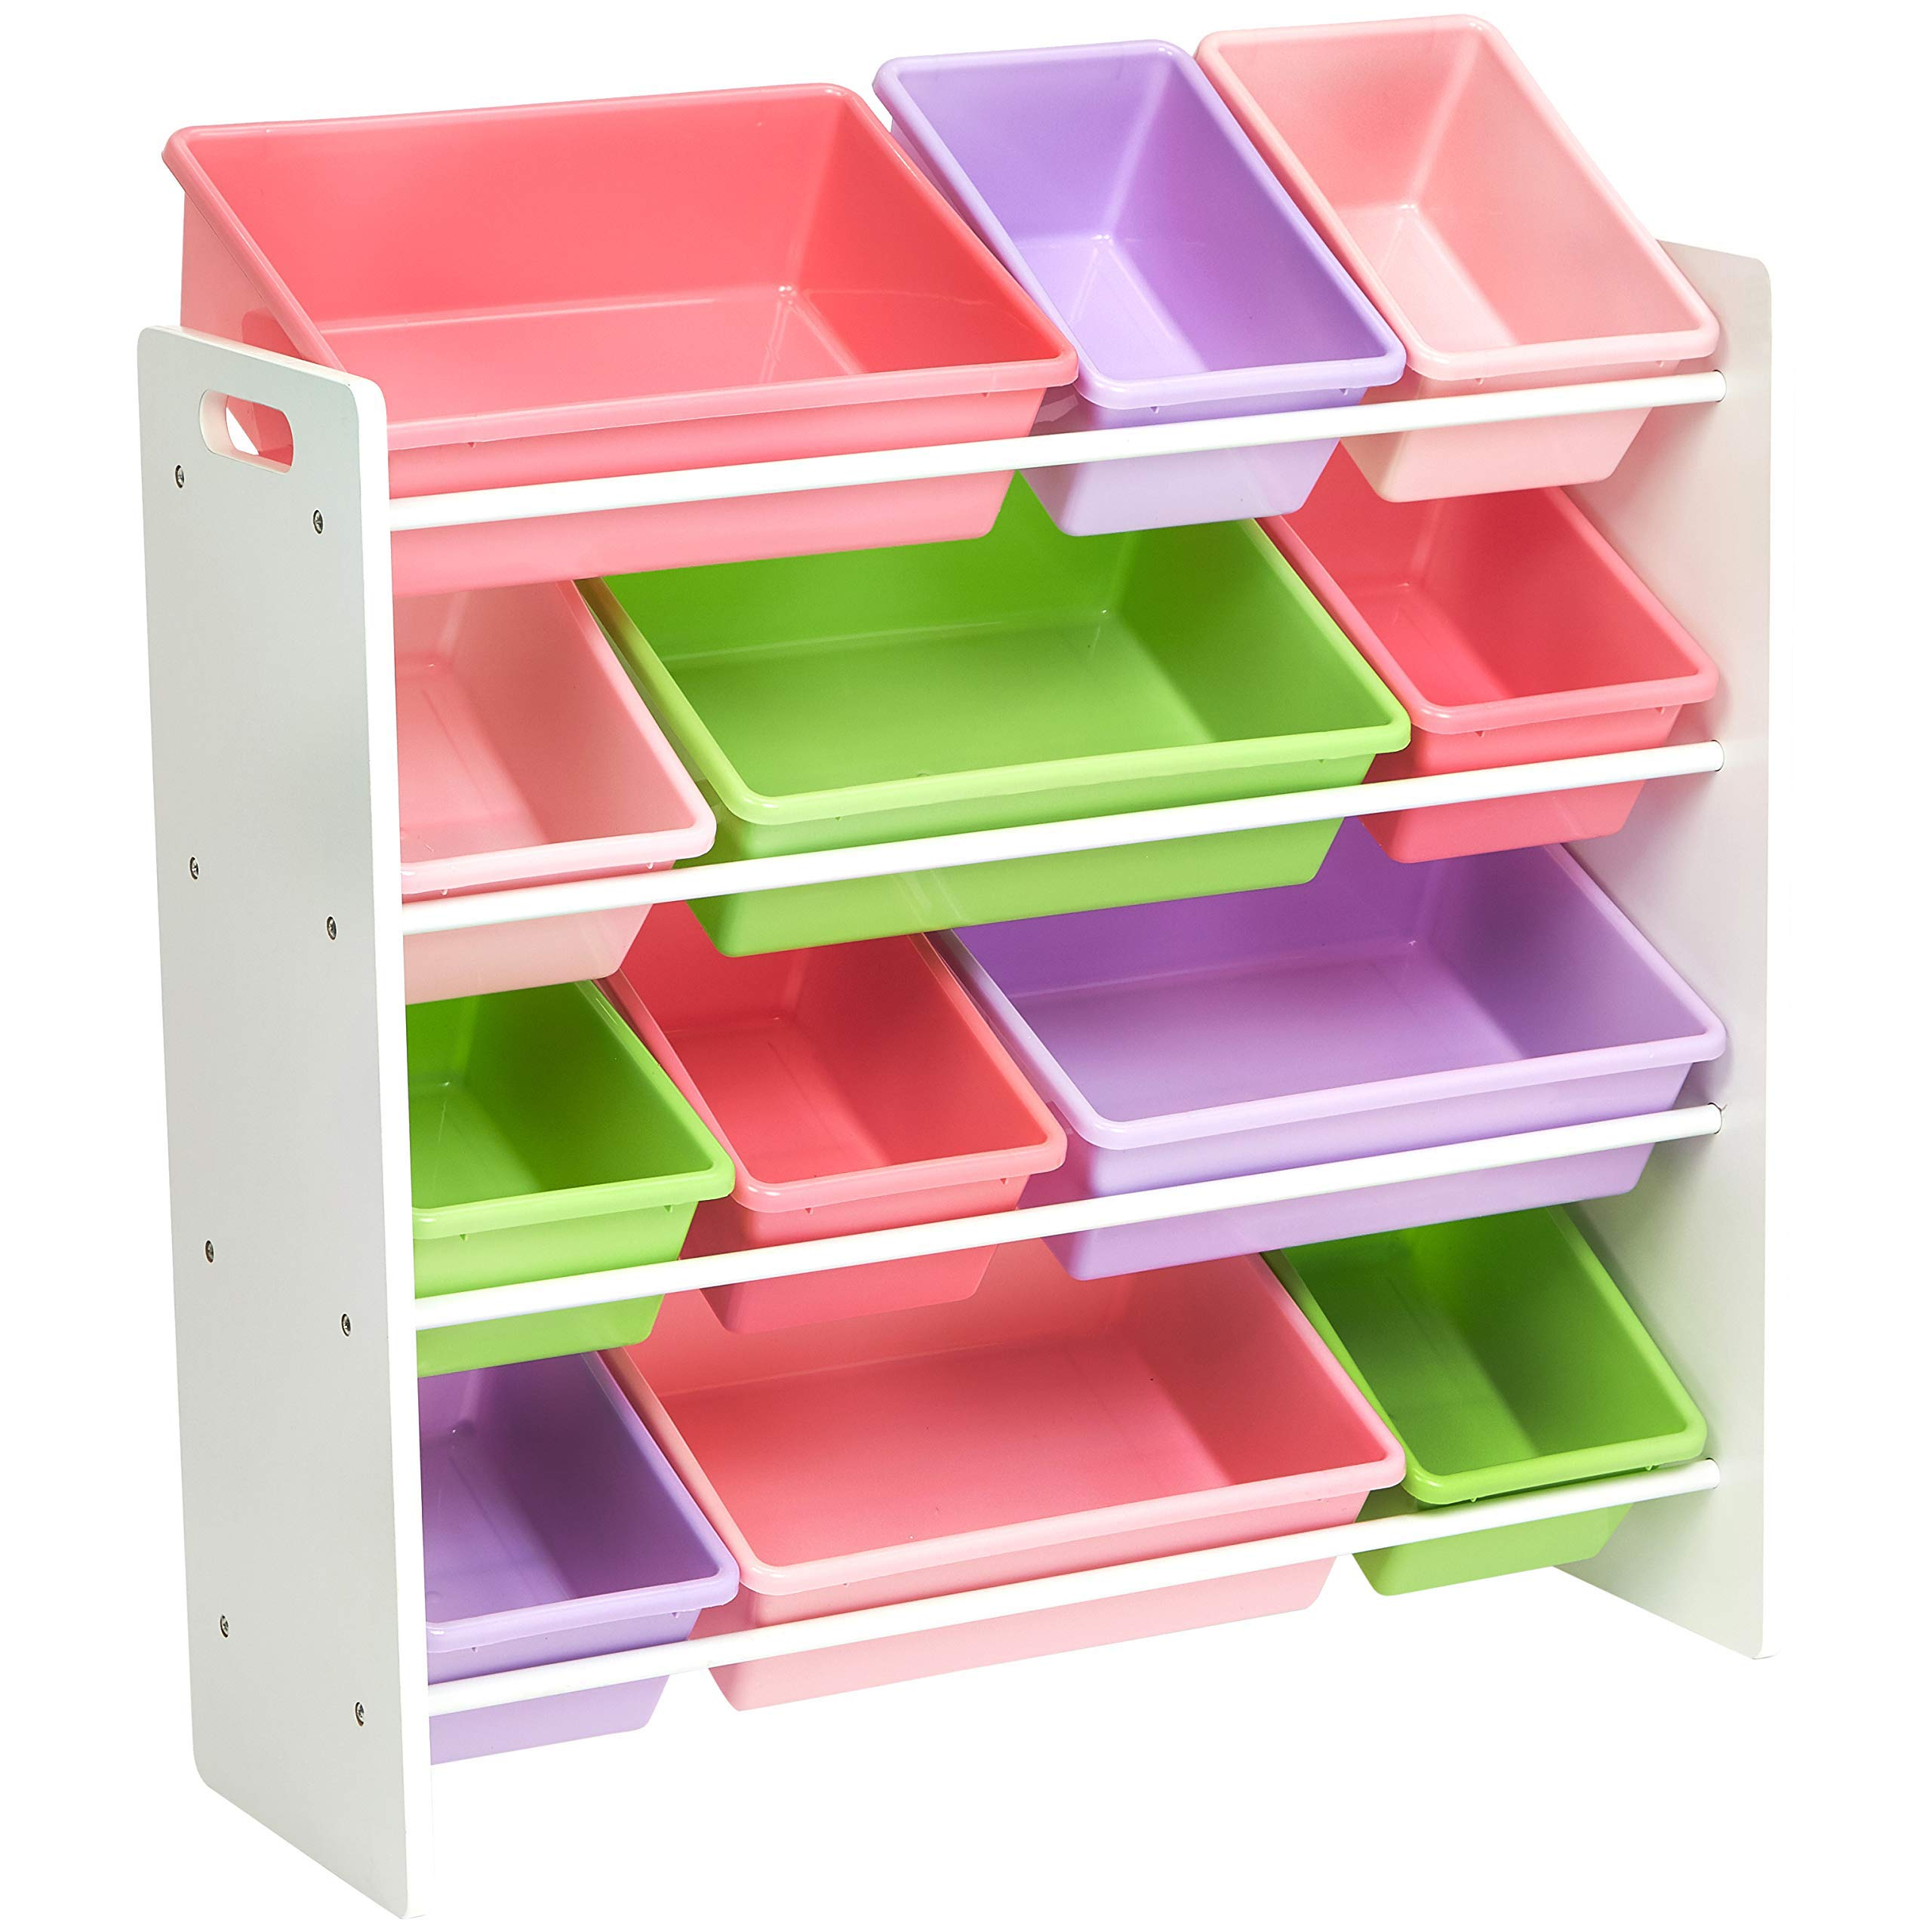 AmazonBasics Kids Toy Storage Organizer Bins - White/Pastel by AmazonBasics (Image #1)